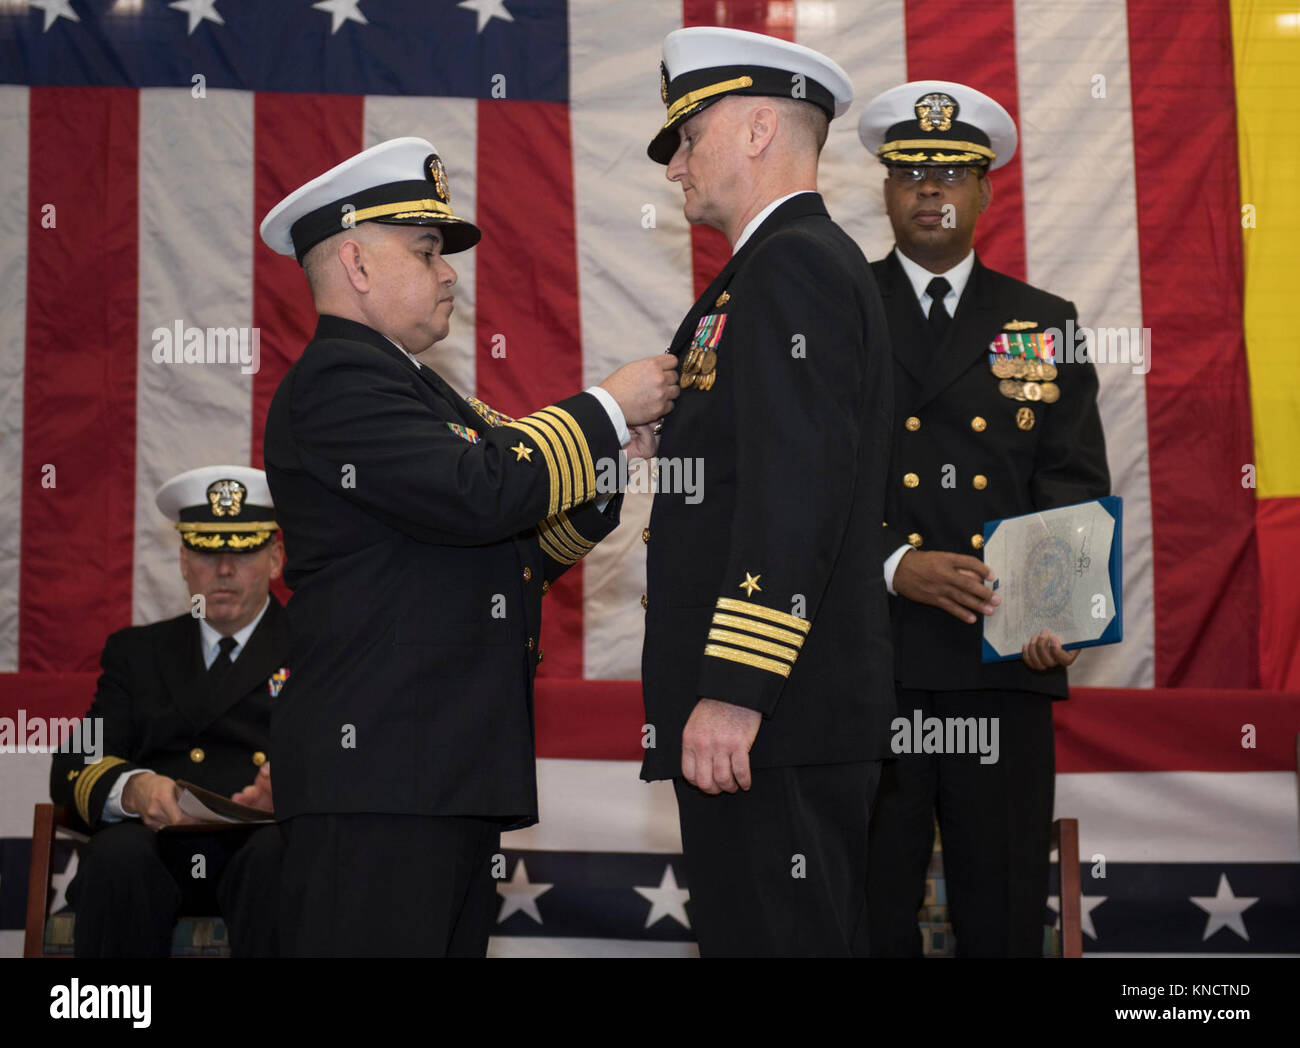 Capt  Lawrence Vasquez, left, chief of staff, Navy Region